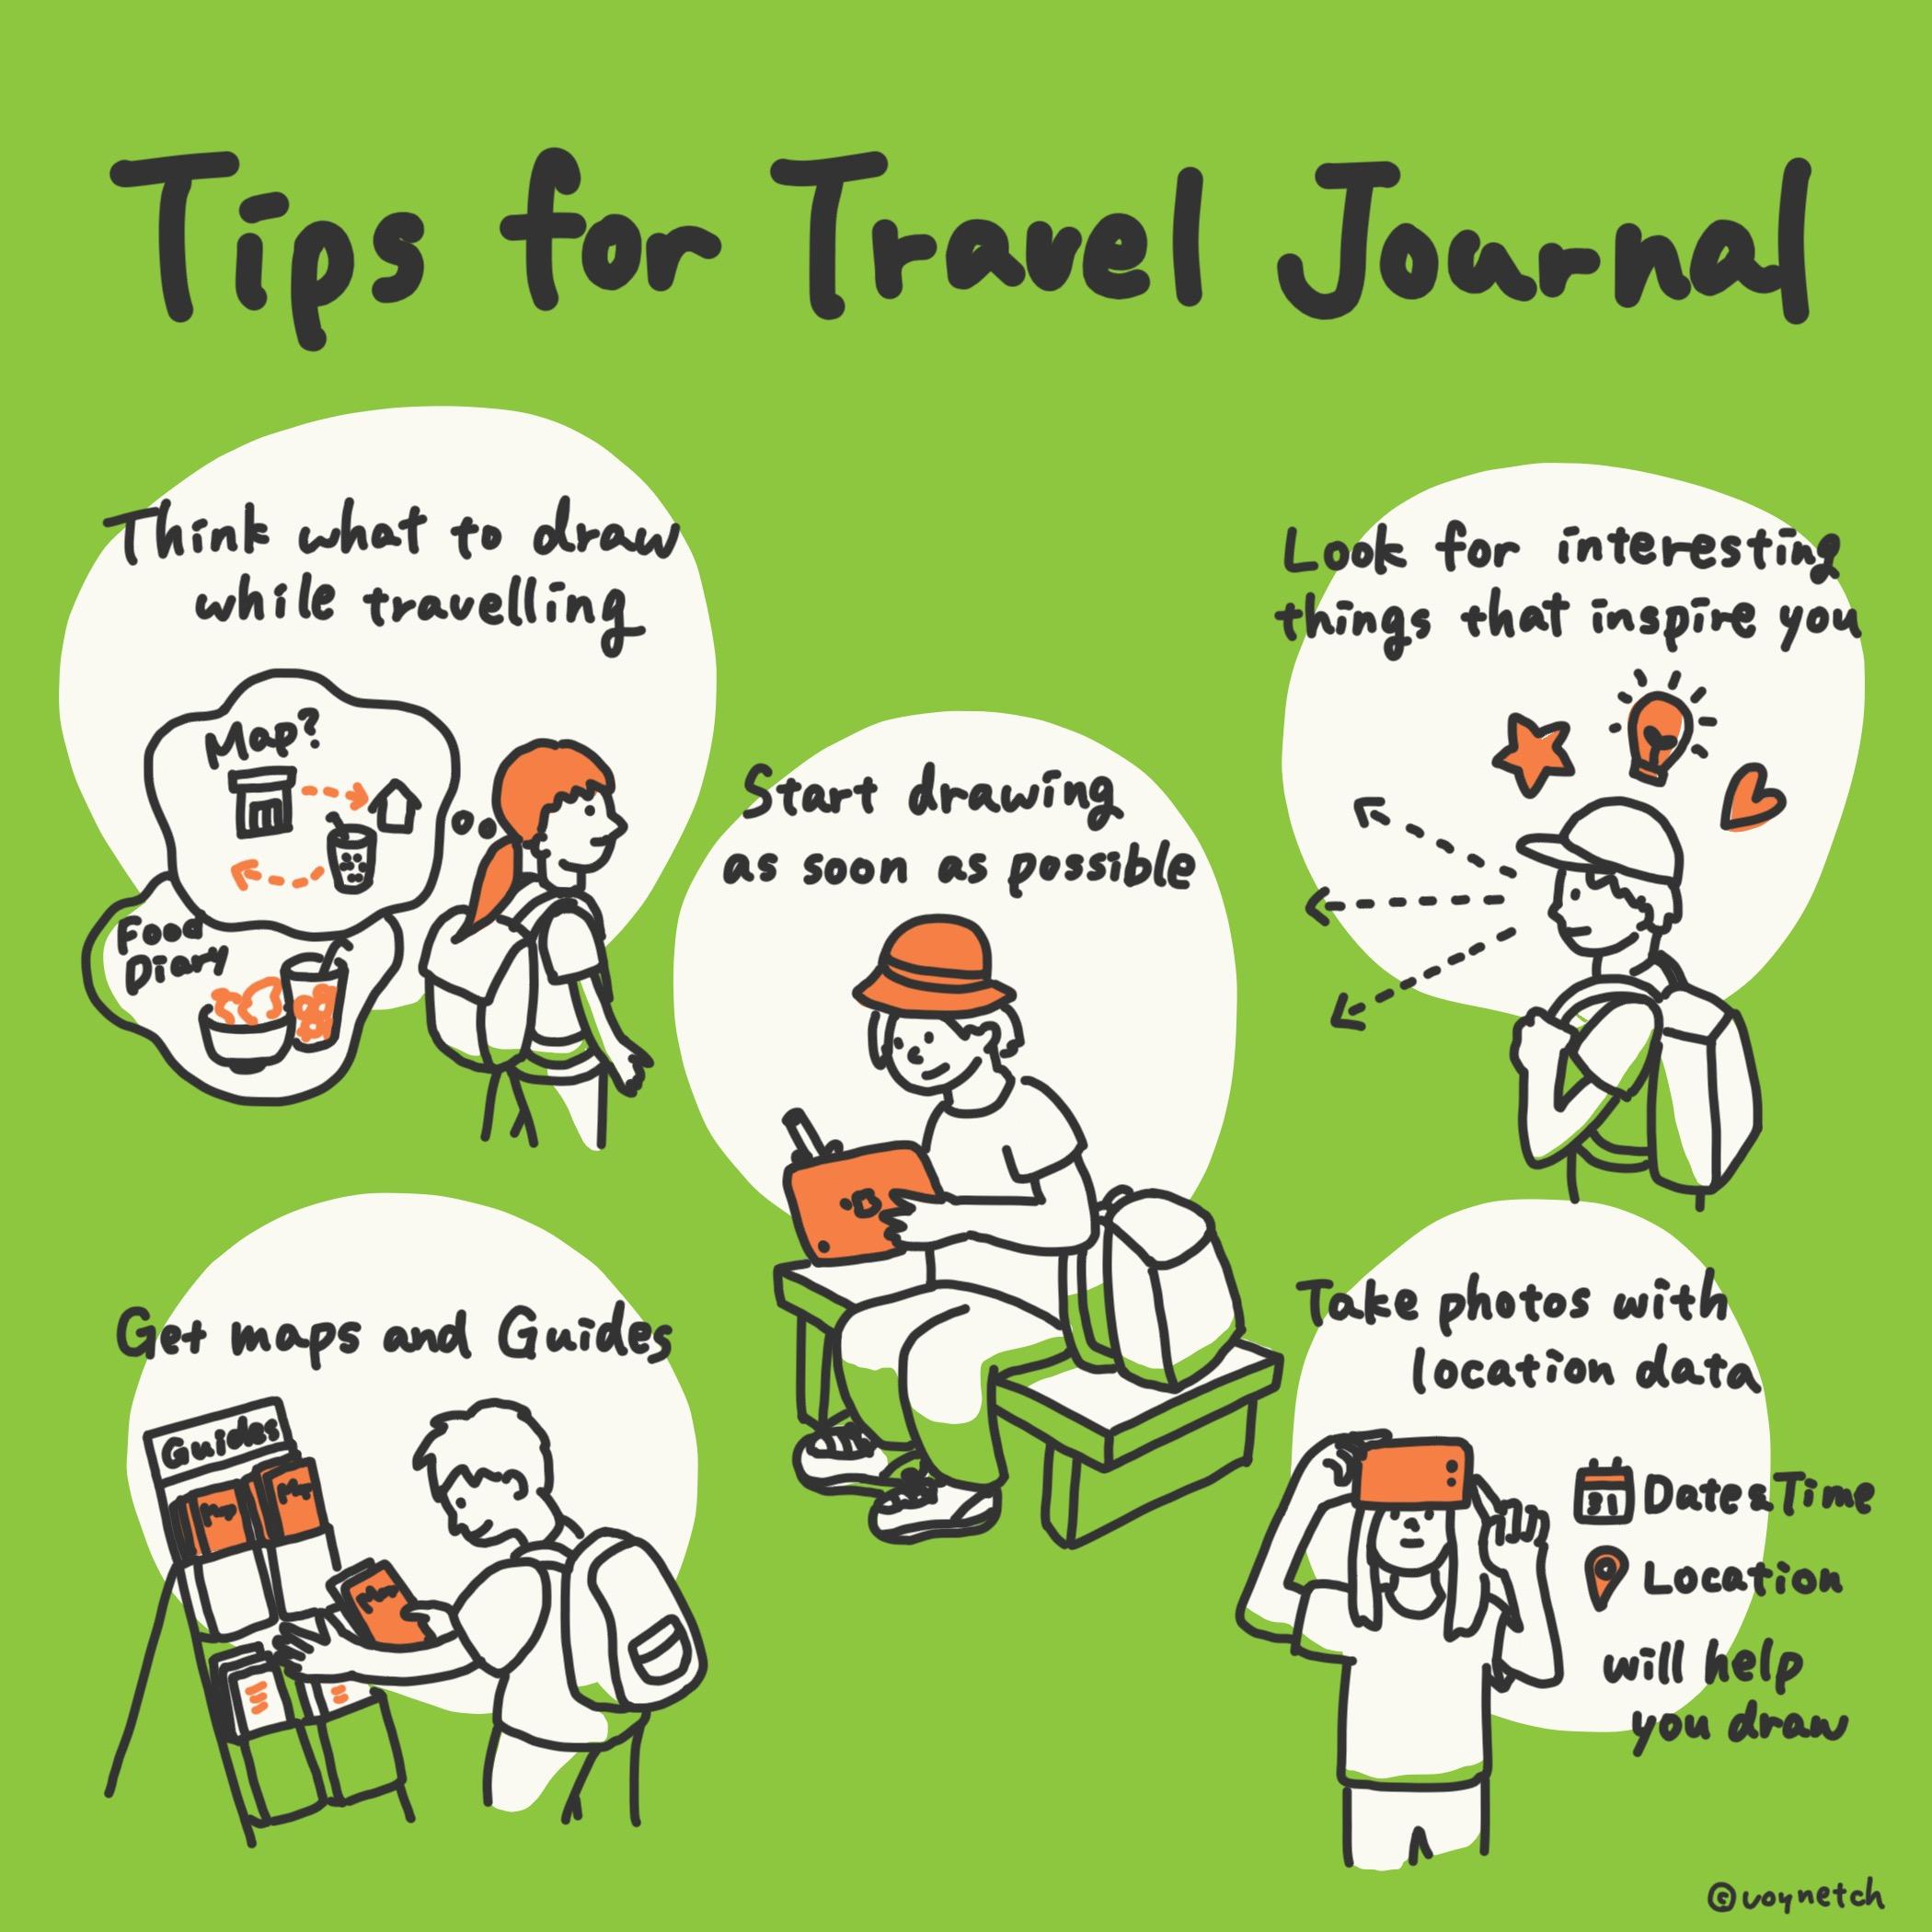 Tips for Travel Journal Image